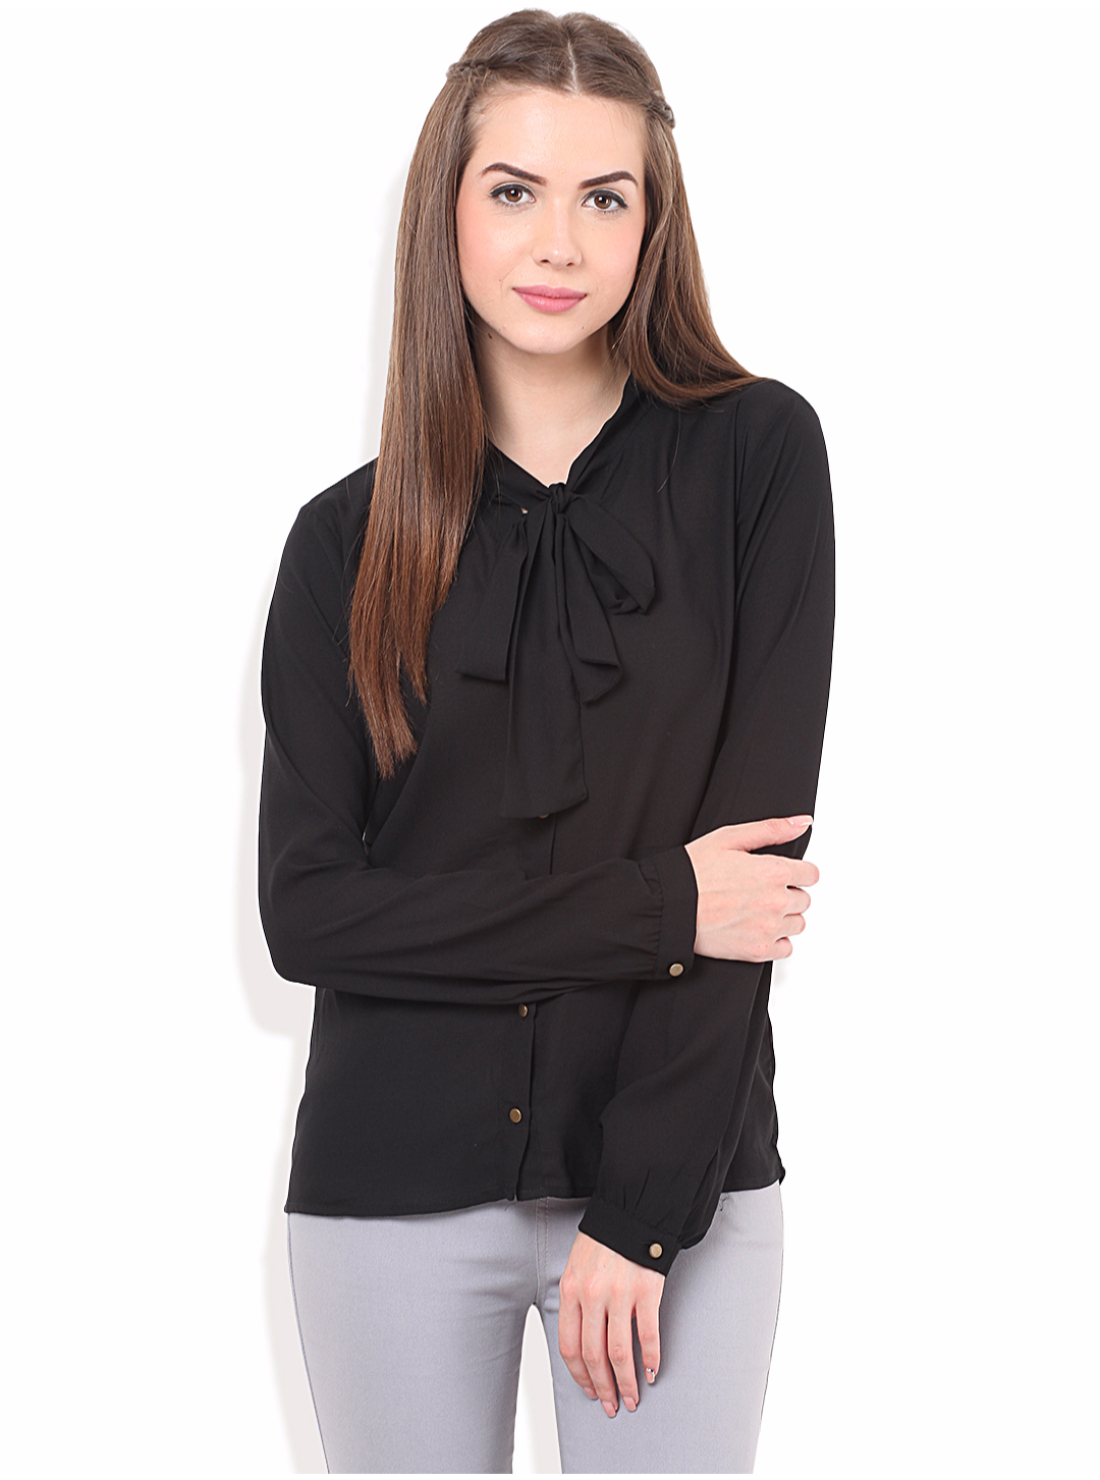 Porsorte | PORSORTE Women's Formal Black Front Tie Knot Shirt